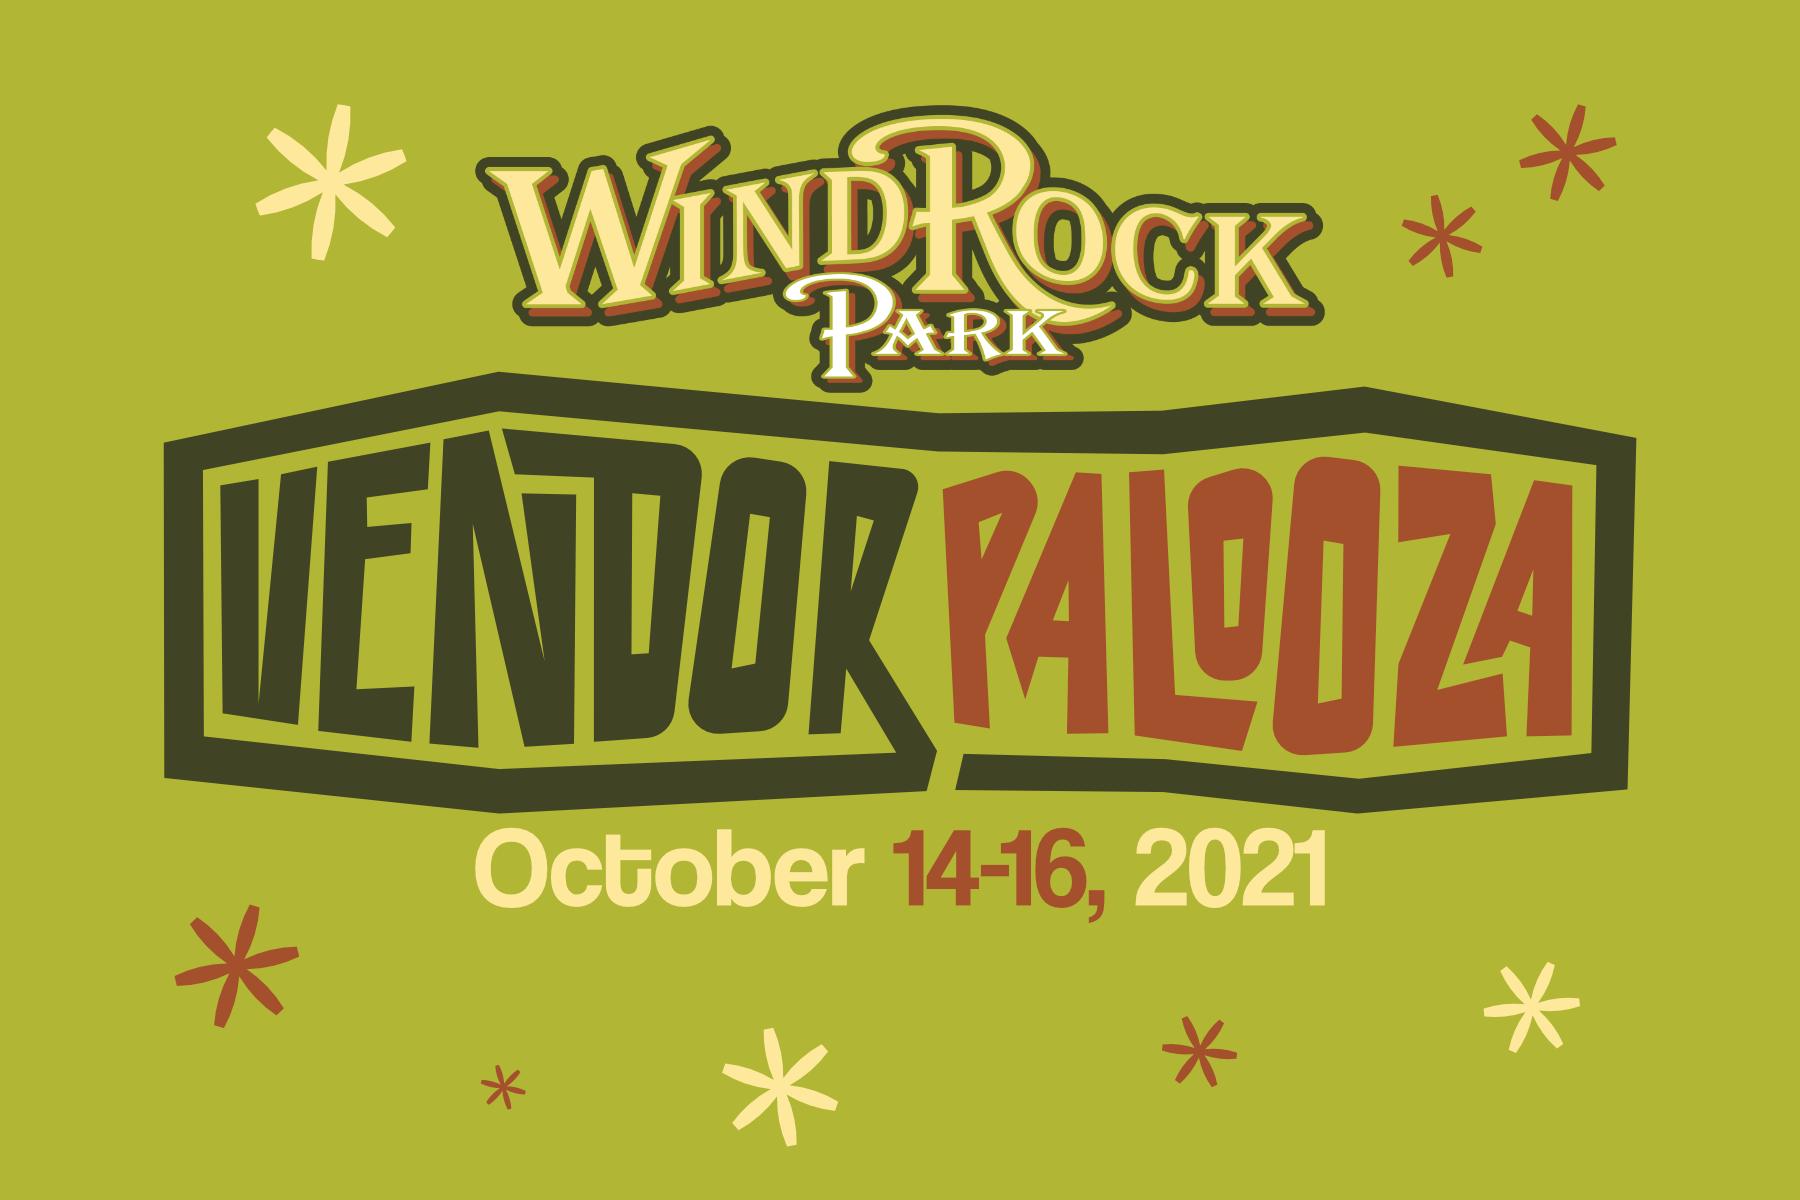 Windrock Park 2021 Vendorpalooza